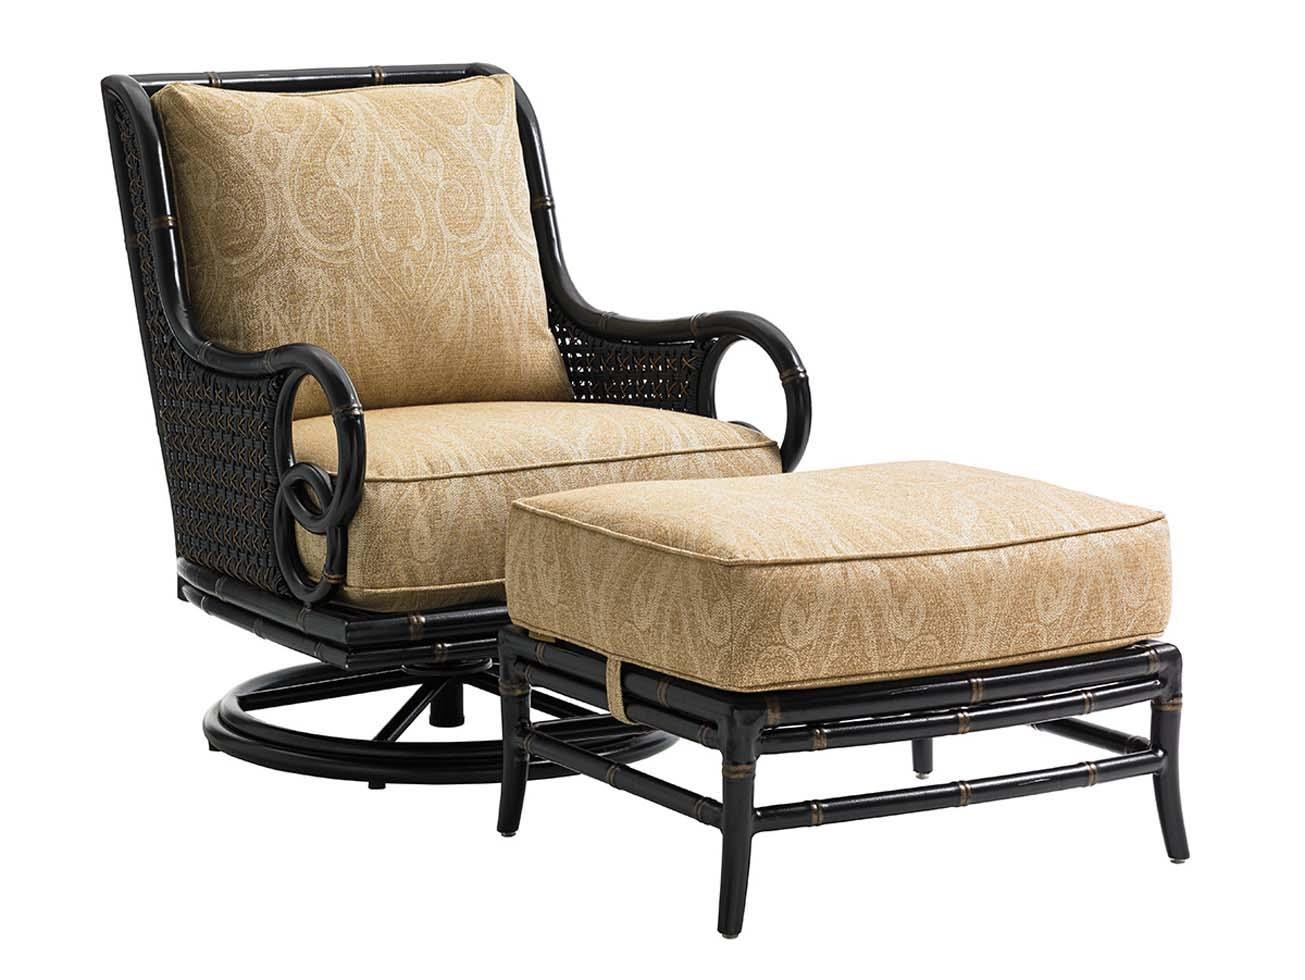 rocker outdoor chairs ergonomic chair rogan tommy bahama living marimba swivel lounge marimbaswivel and ottoman